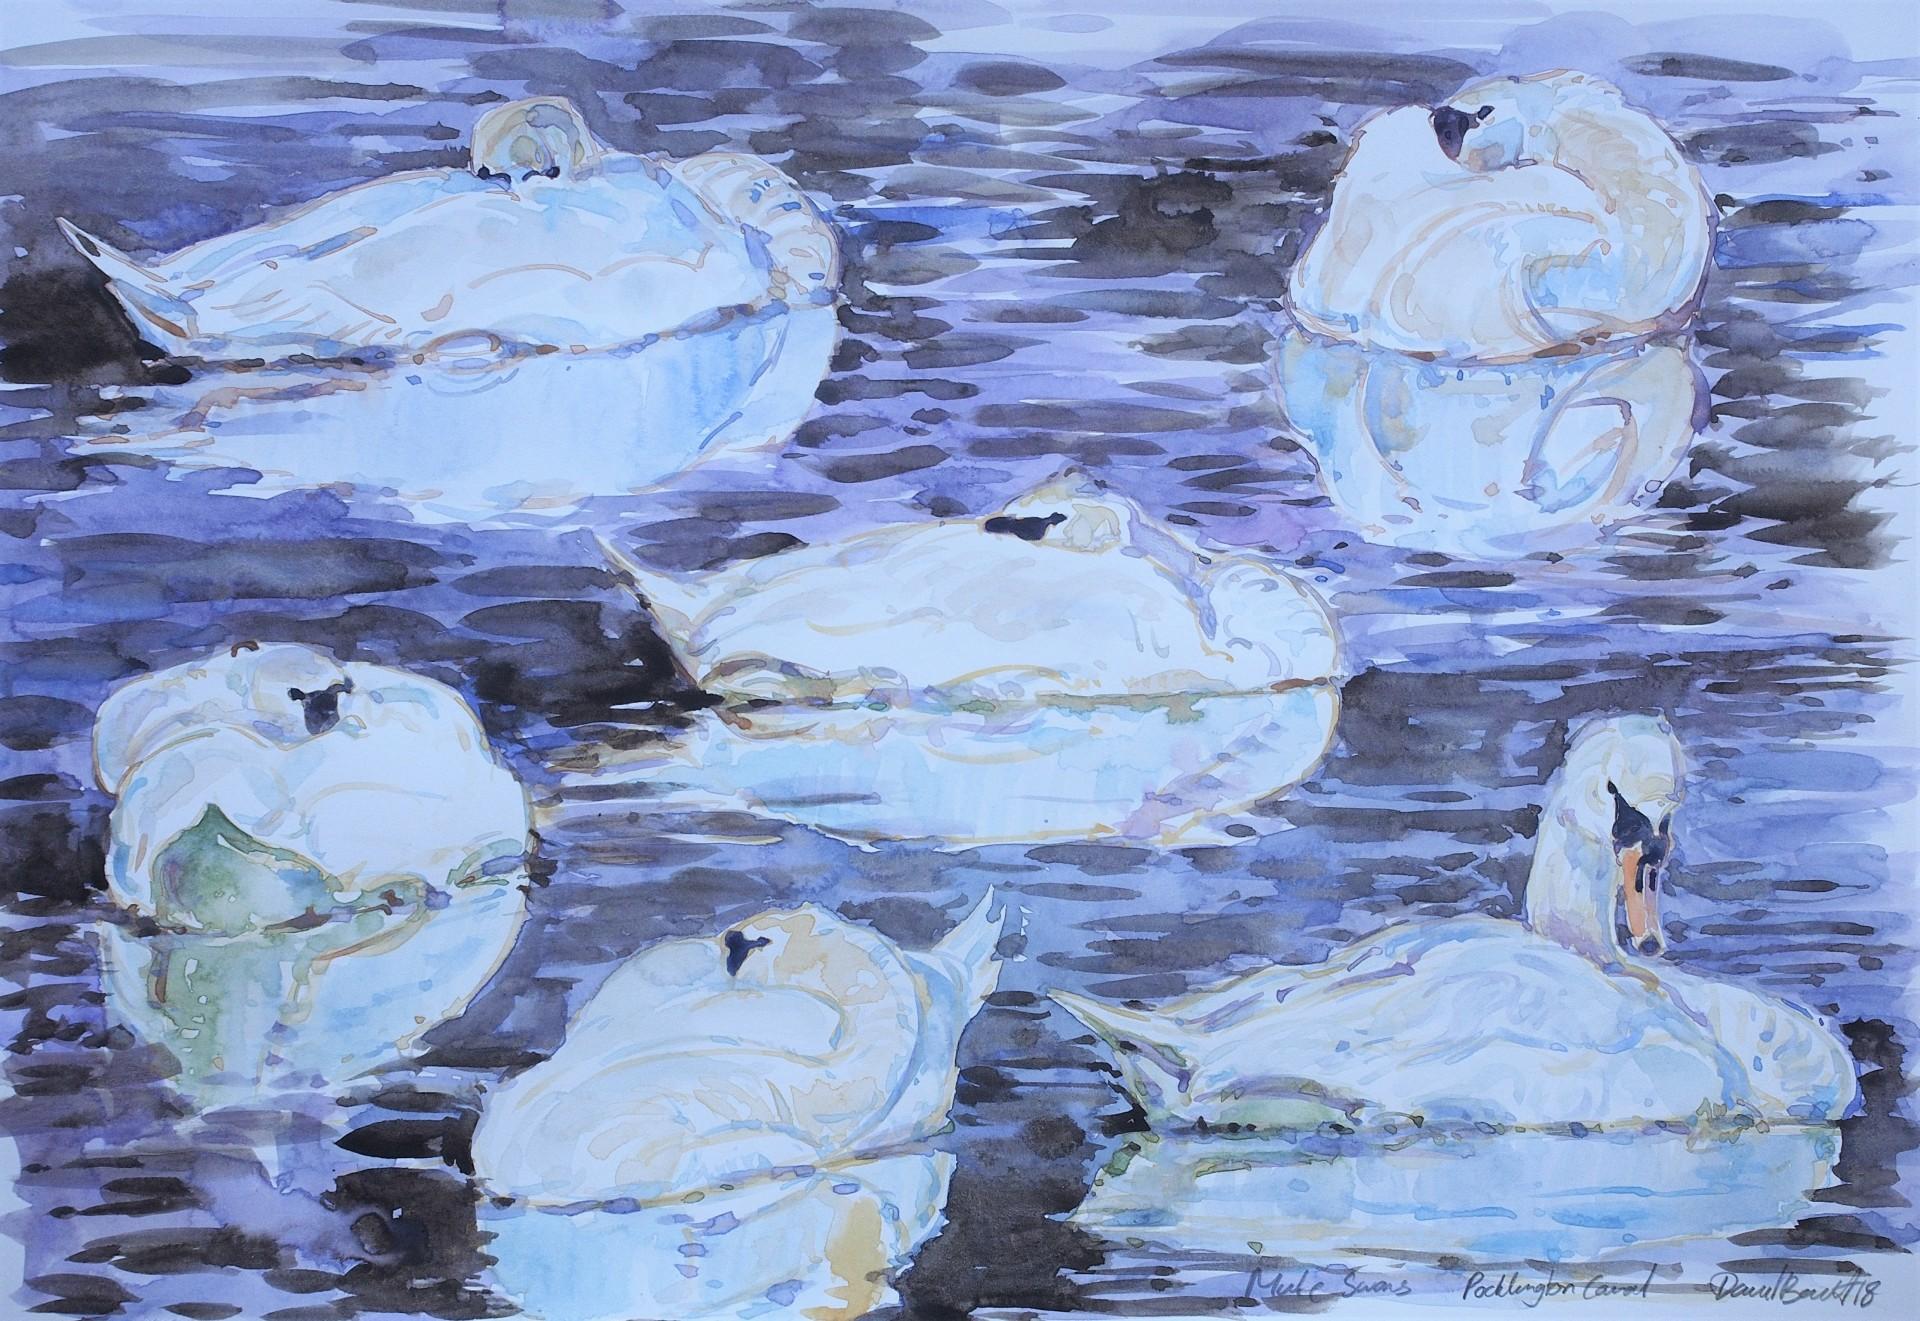 Mute Swan Studies, Pocklington Canal